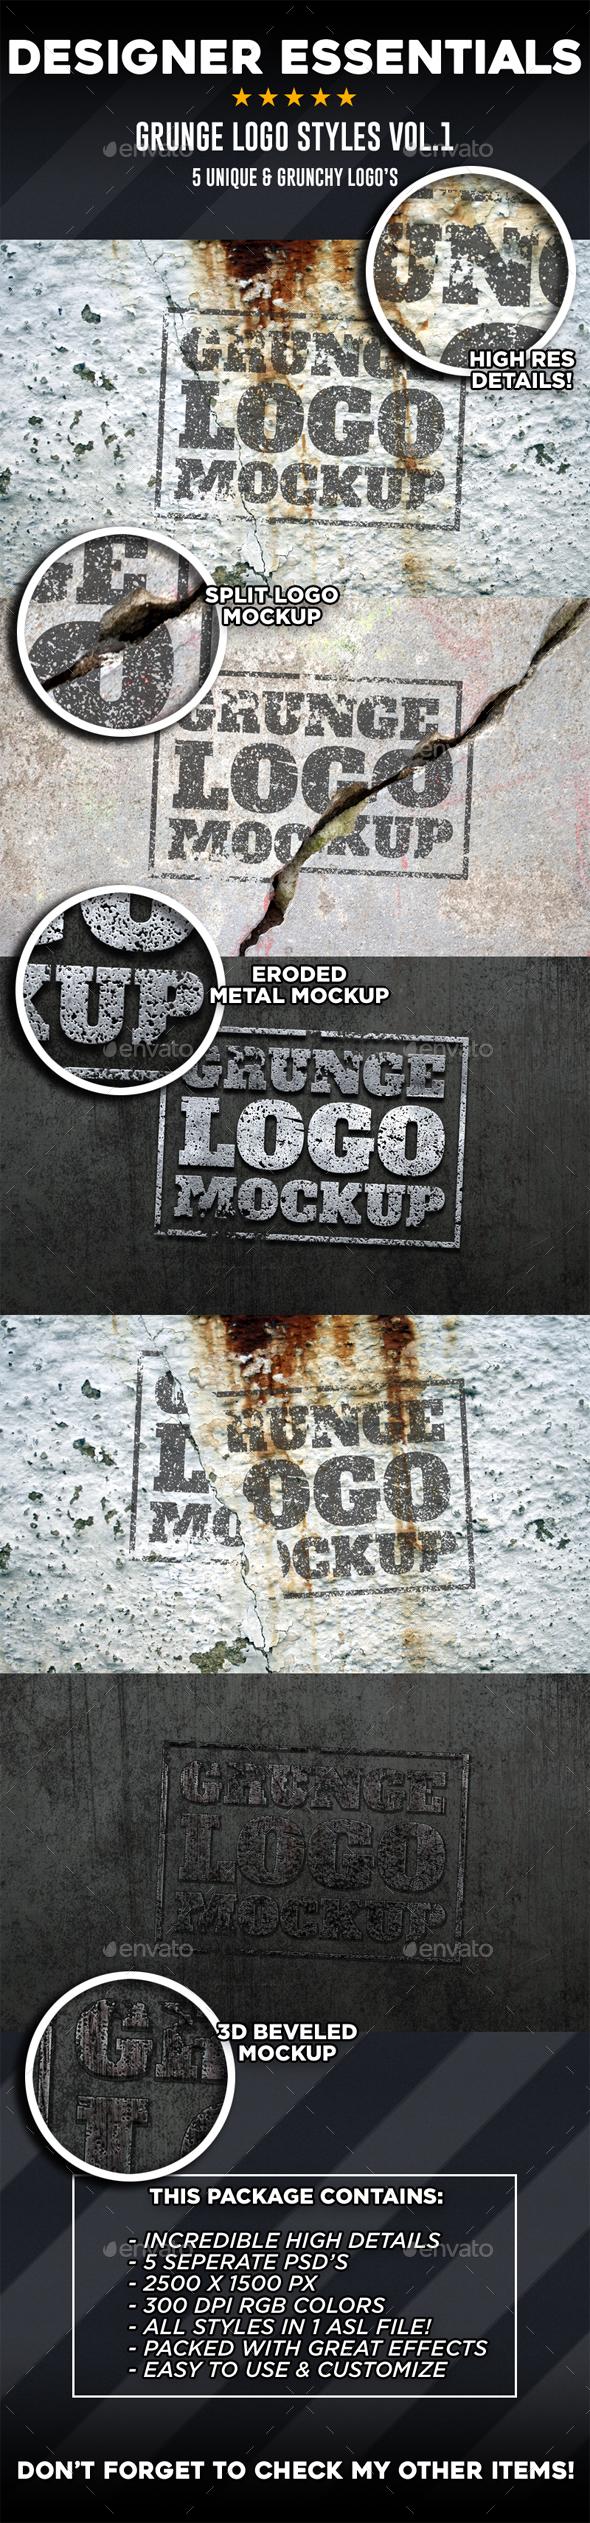 5 Grunge Logo Mockups Vol.1 - Logo Product Mock-Ups